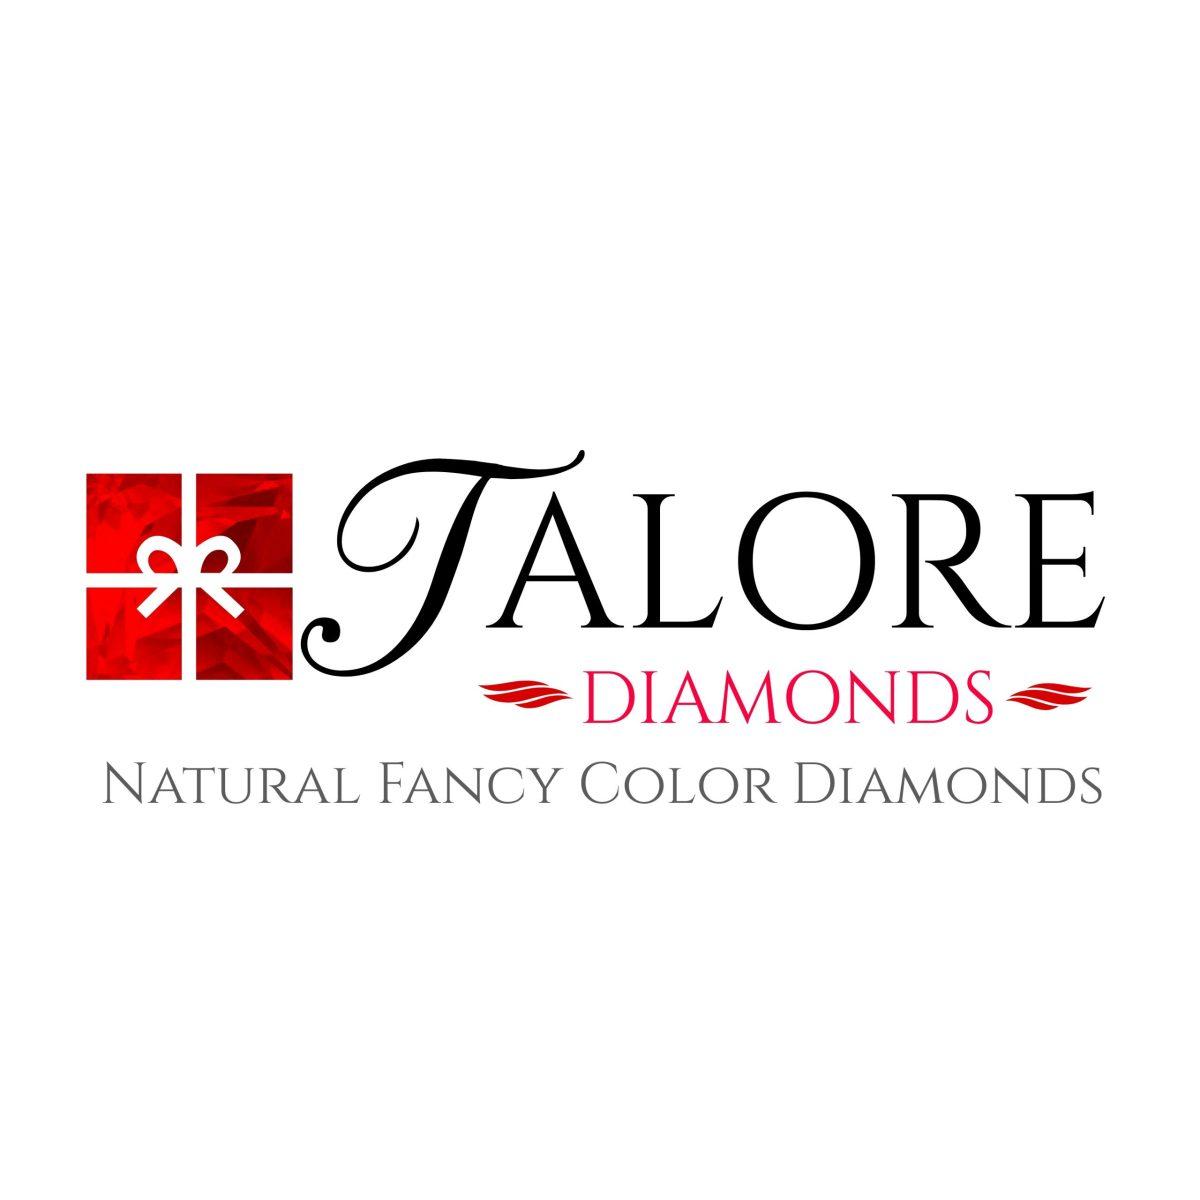 talore diamonds natural fancy color diamonds